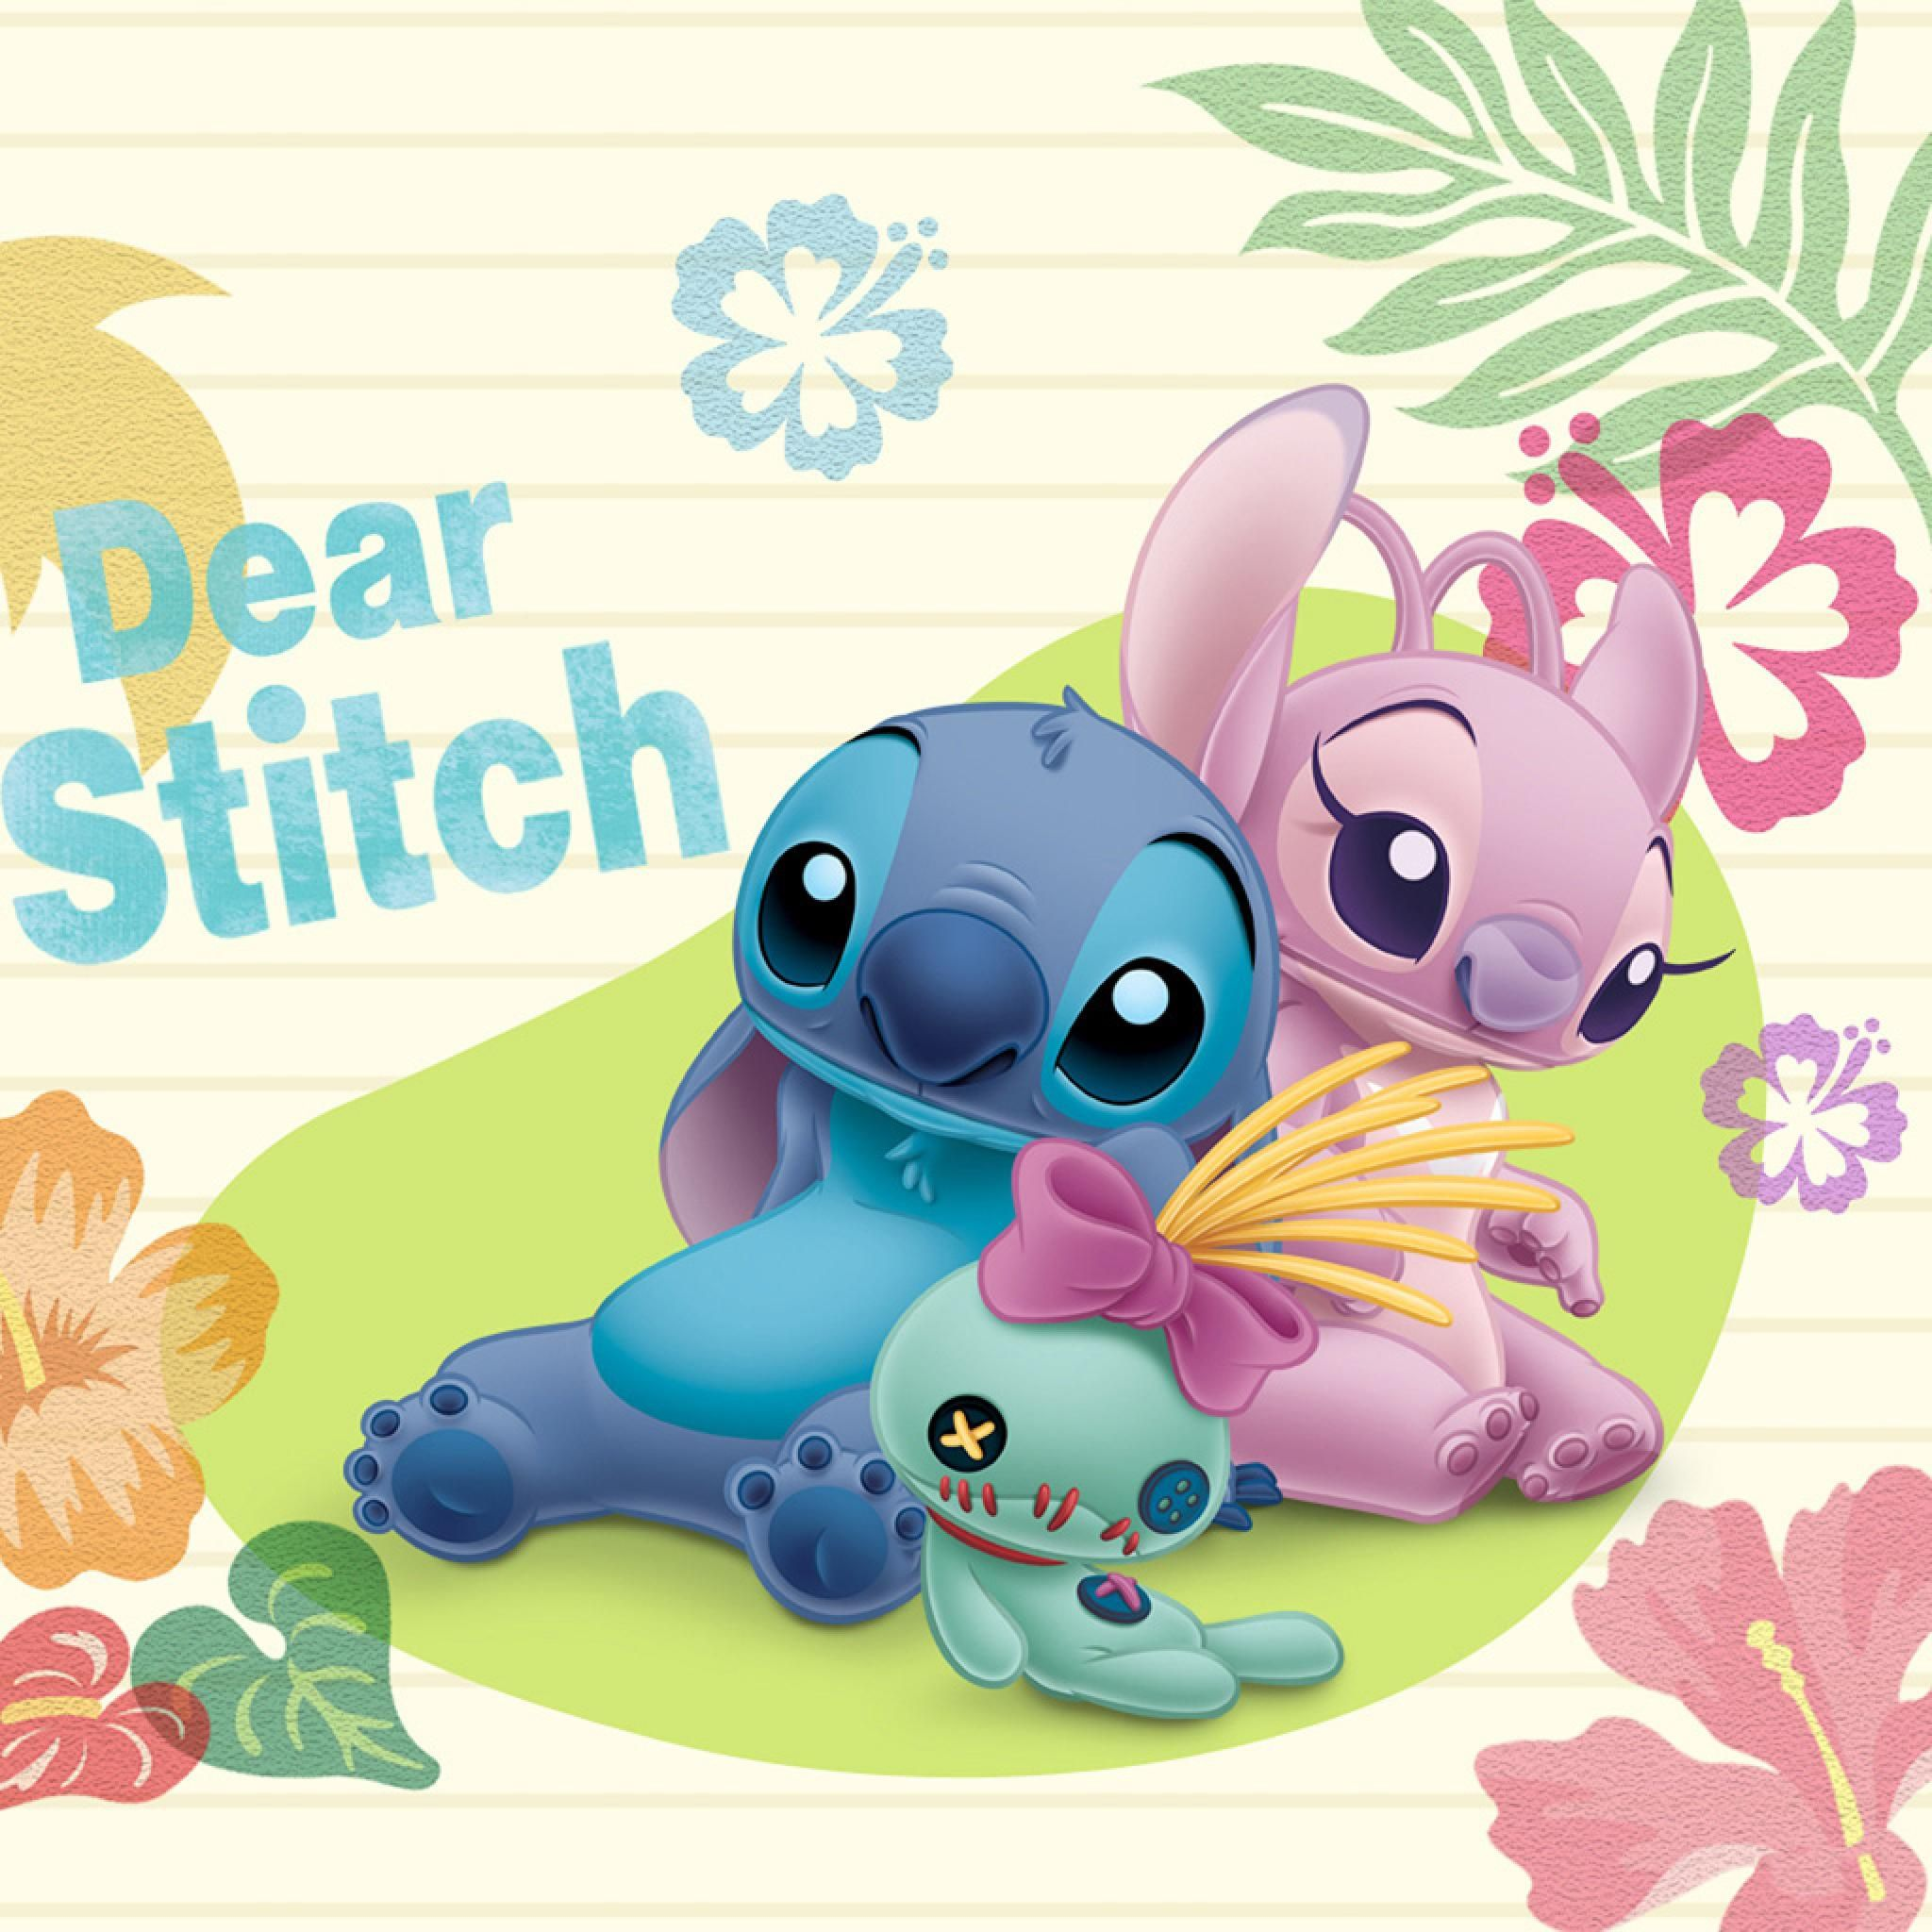 Stitch & his girl Disney characters stitch, Lilo and stitch